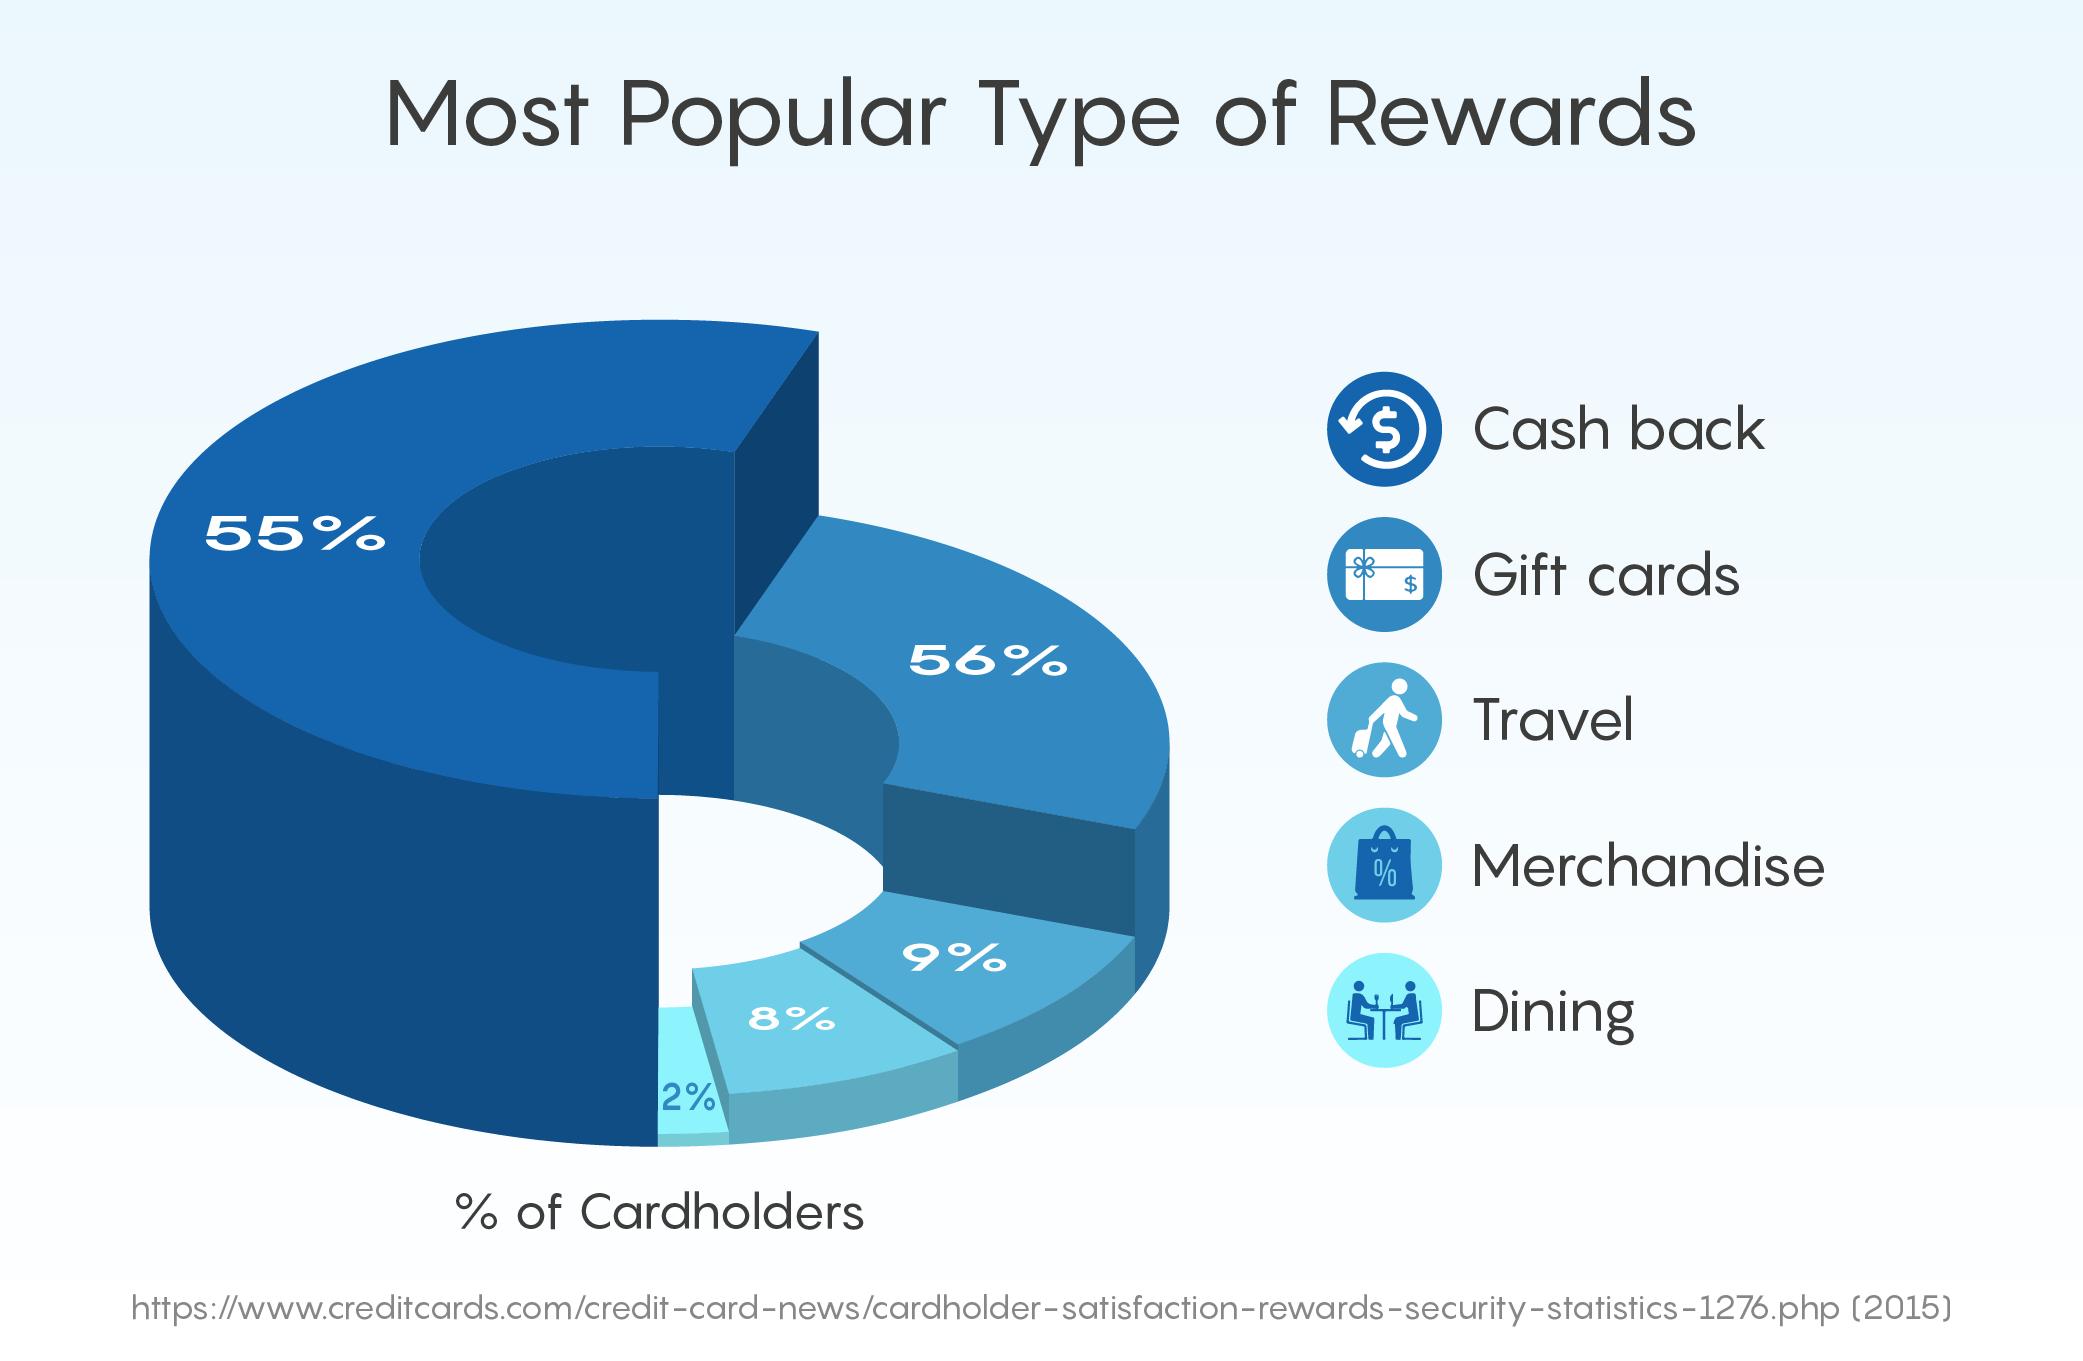 Most Popular Type of Rewards